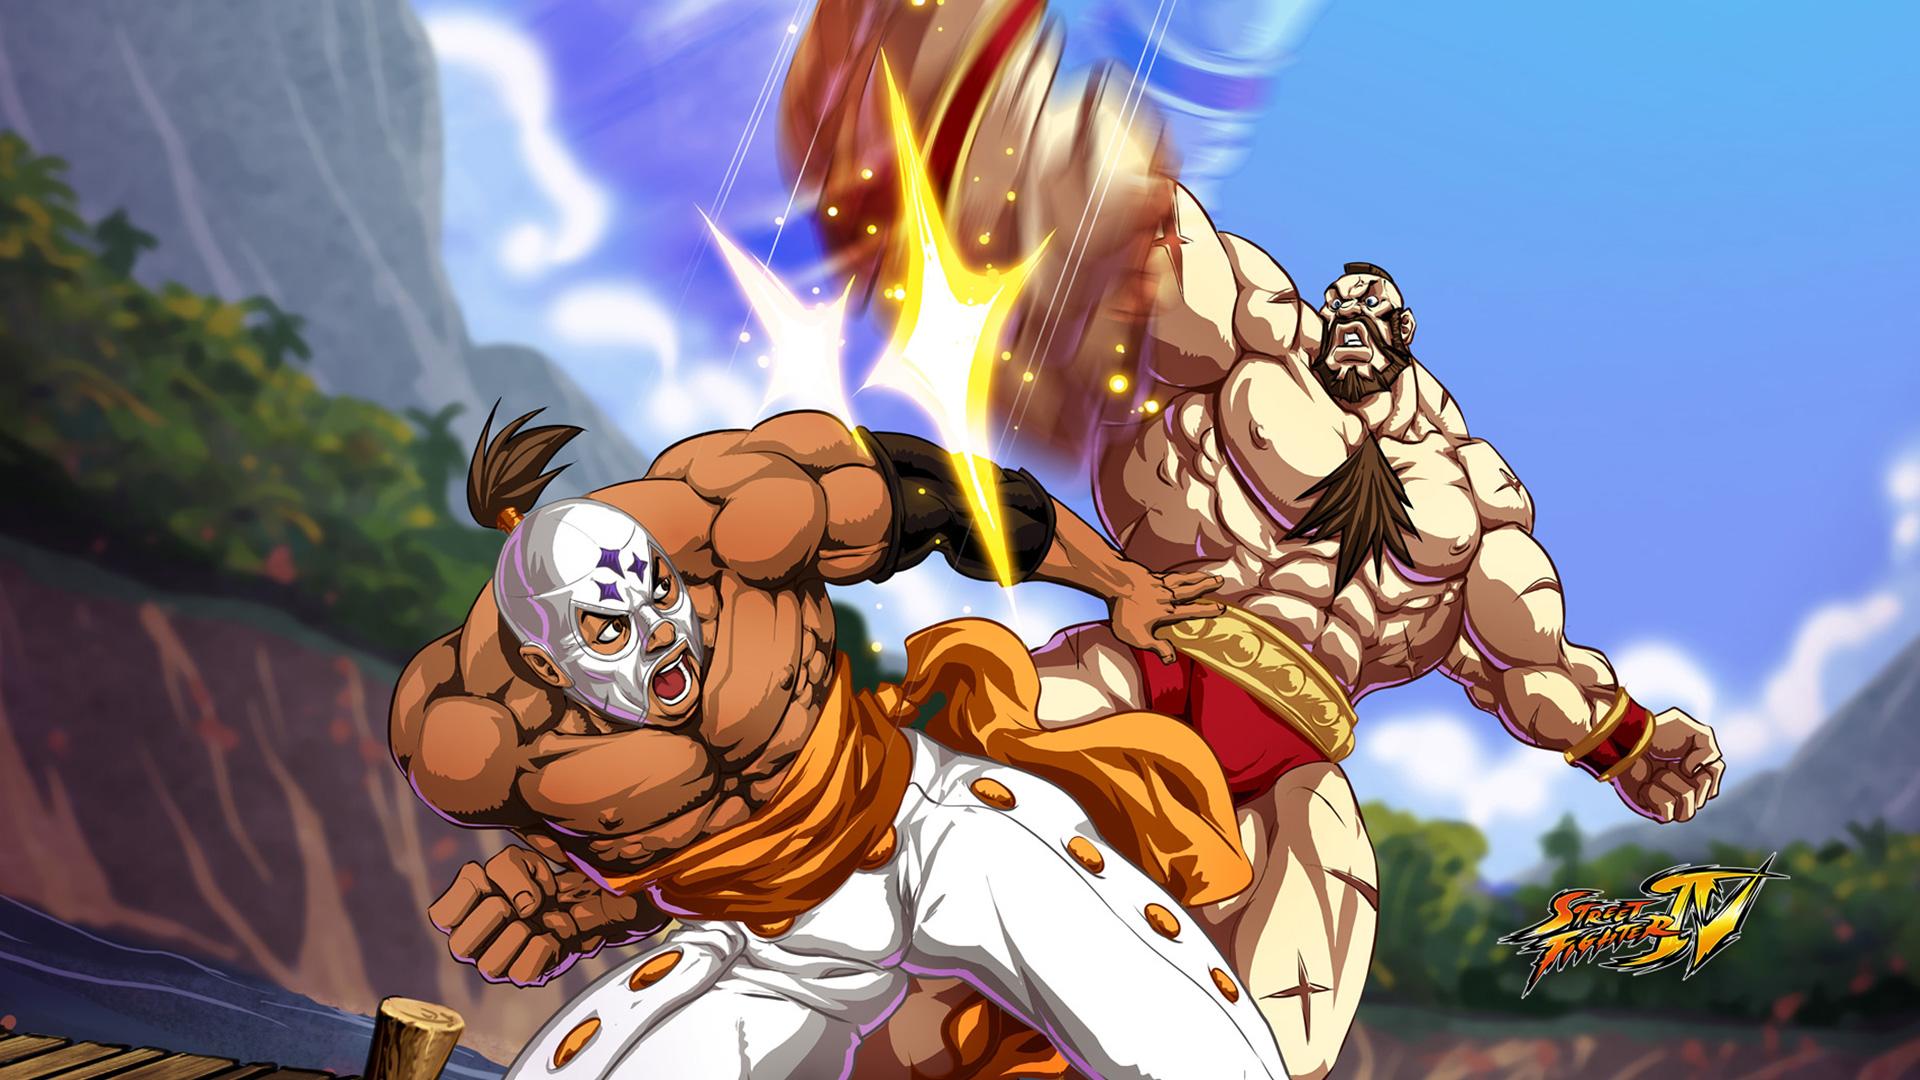 Street Fighter 4 wallpaper 6